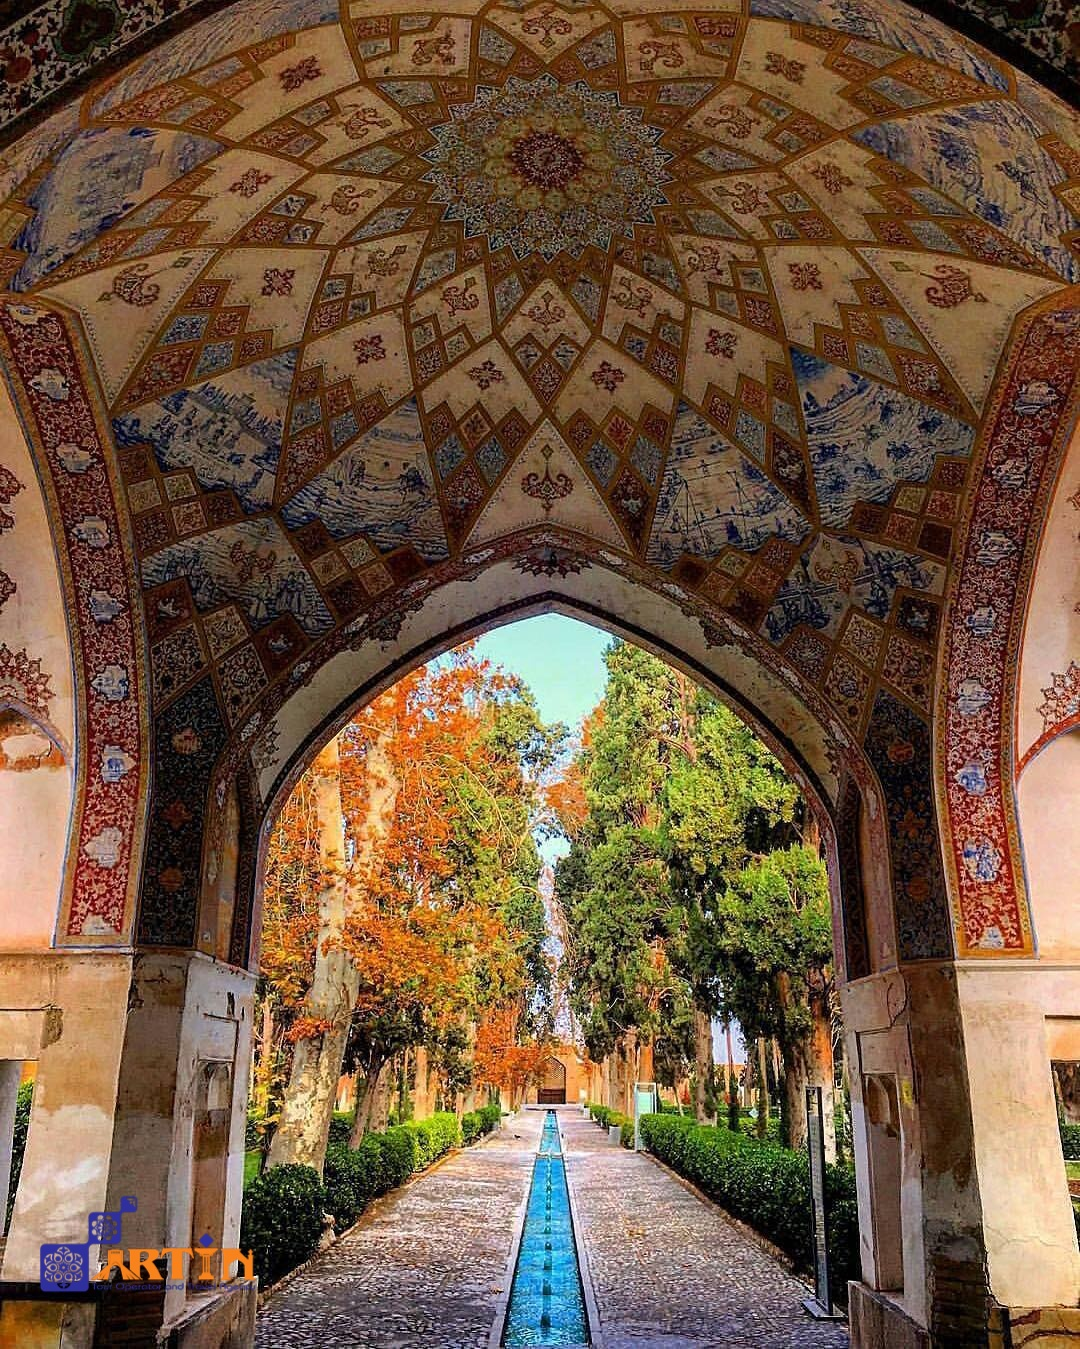 Fin garden kashan travel to Iran travelartin.com